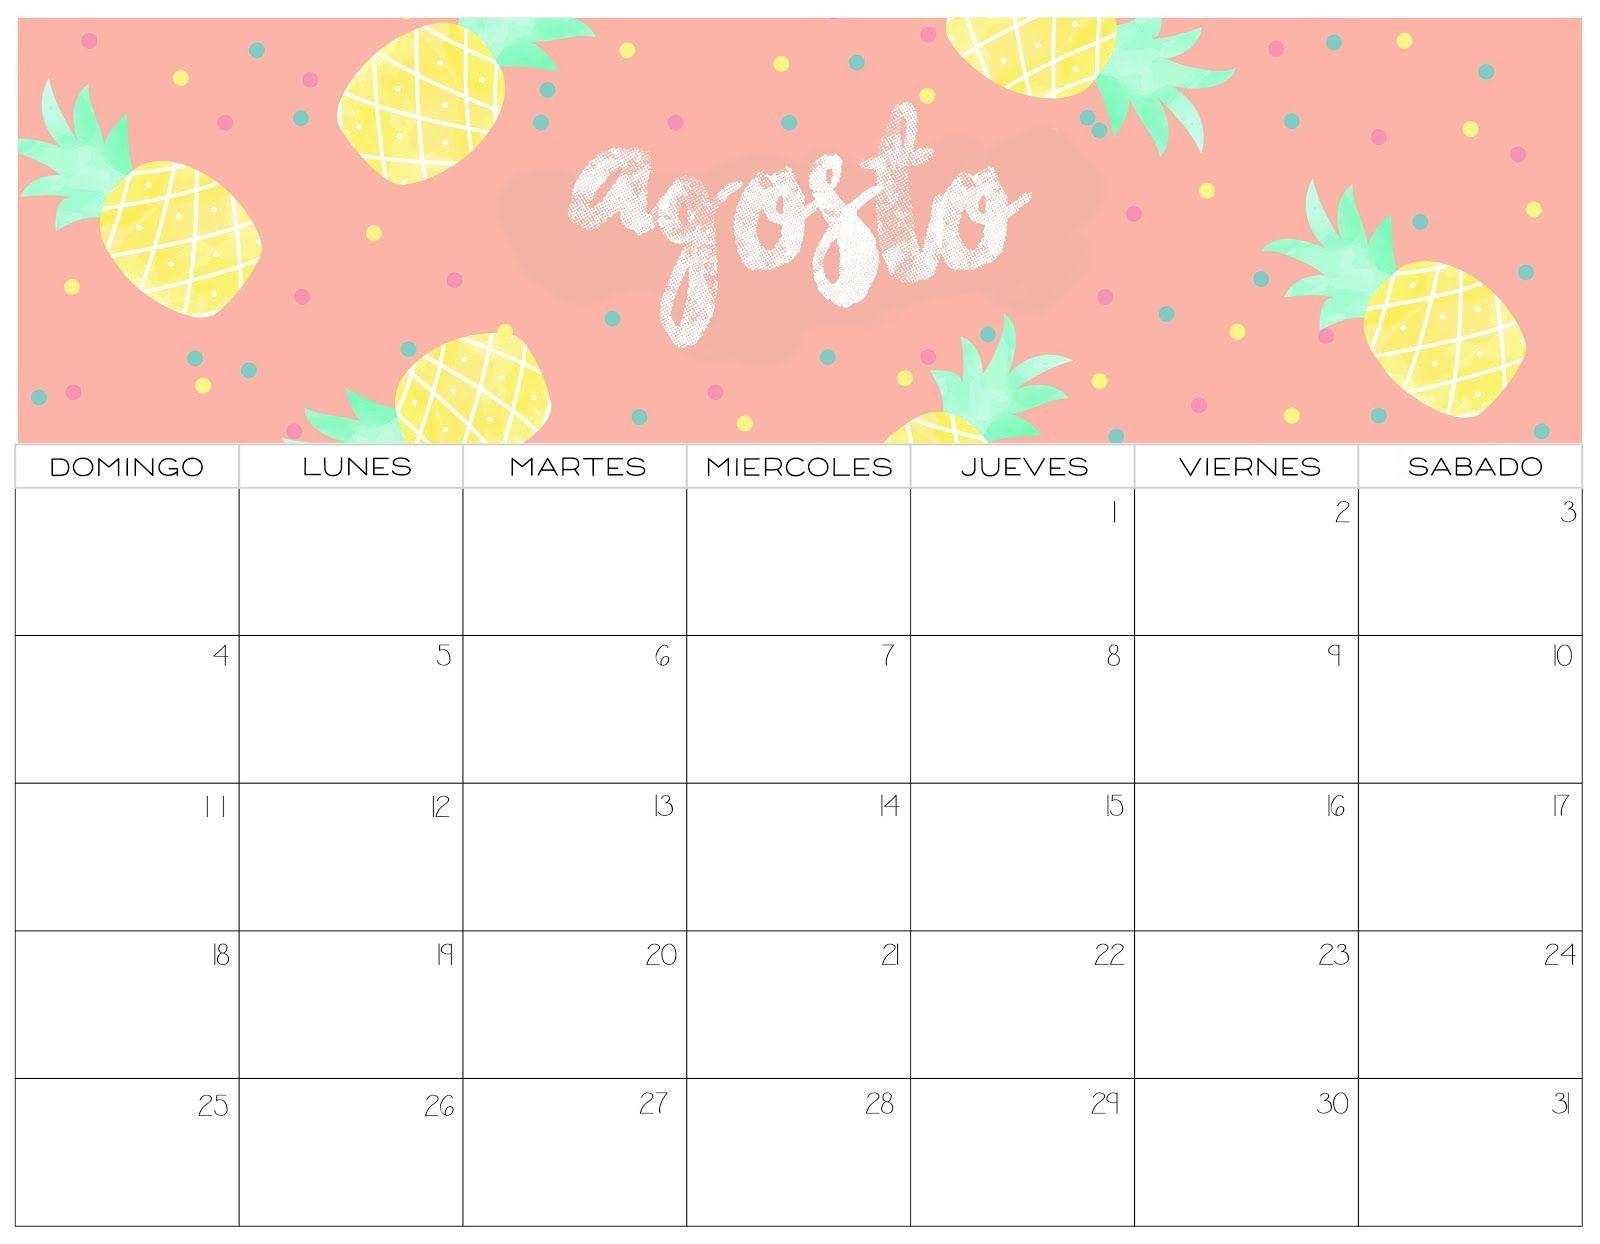 Calendario Enero 2019 Para Imprimir A4 Más Populares Calendario 2019 Colorido 2 Estilos Meses Of Calendario Enero 2019 Para Imprimir A4 Actual Calendario Diciembre De 2019 53ld Calendario T